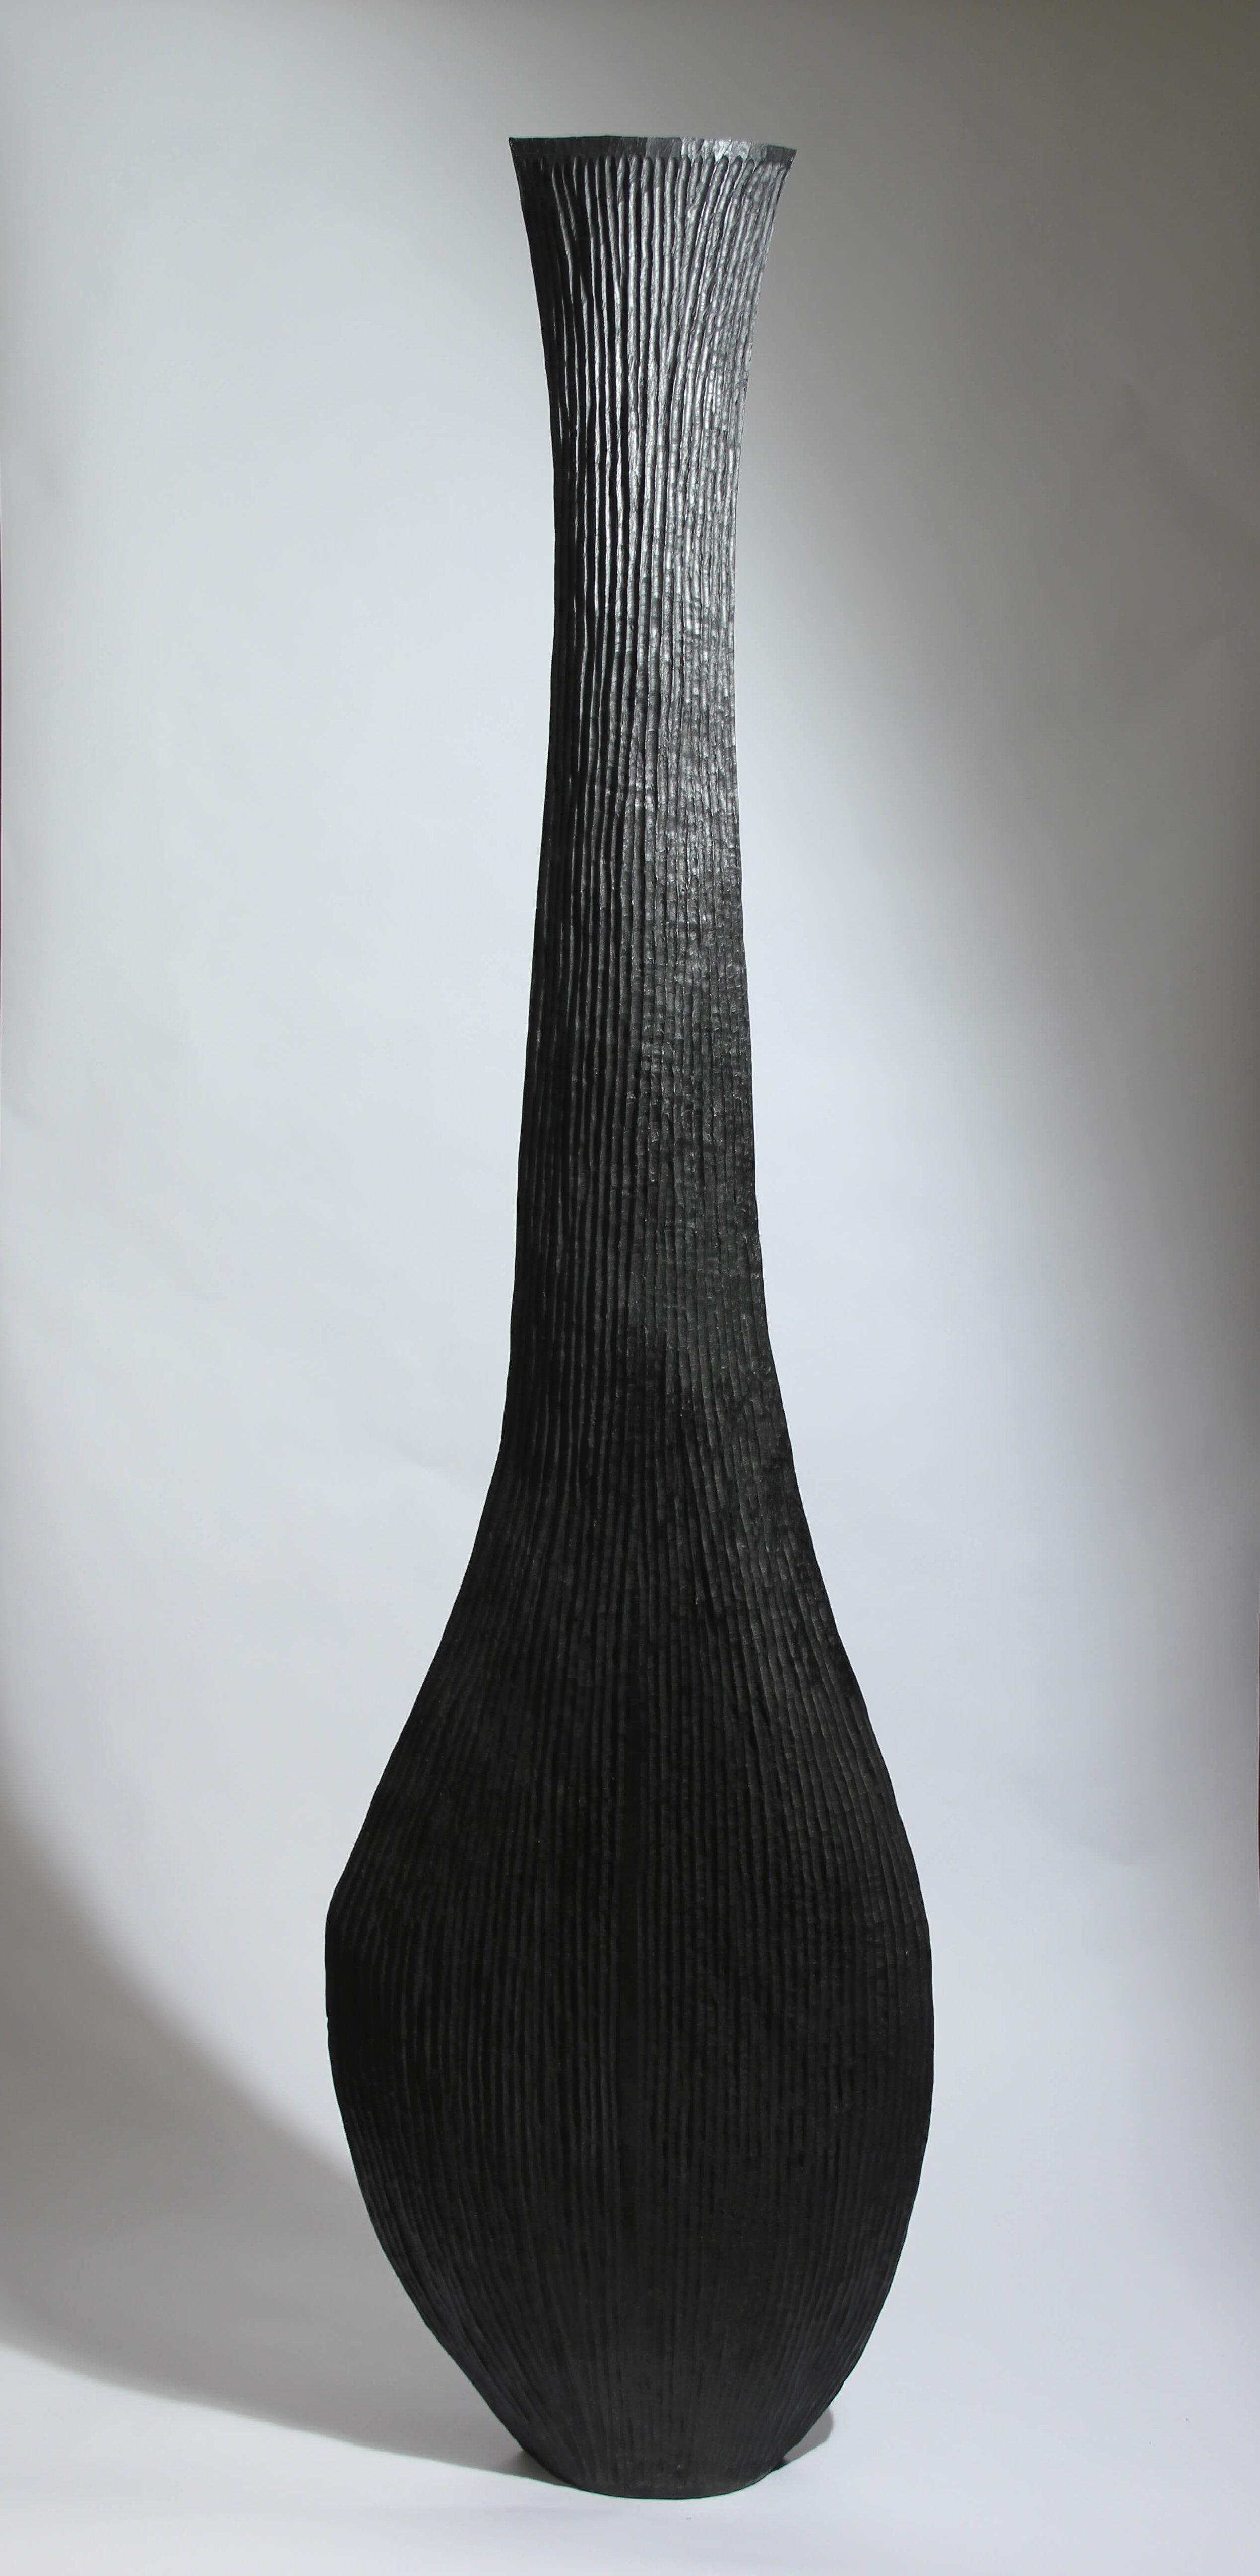 188 Great Black Flask, 2014